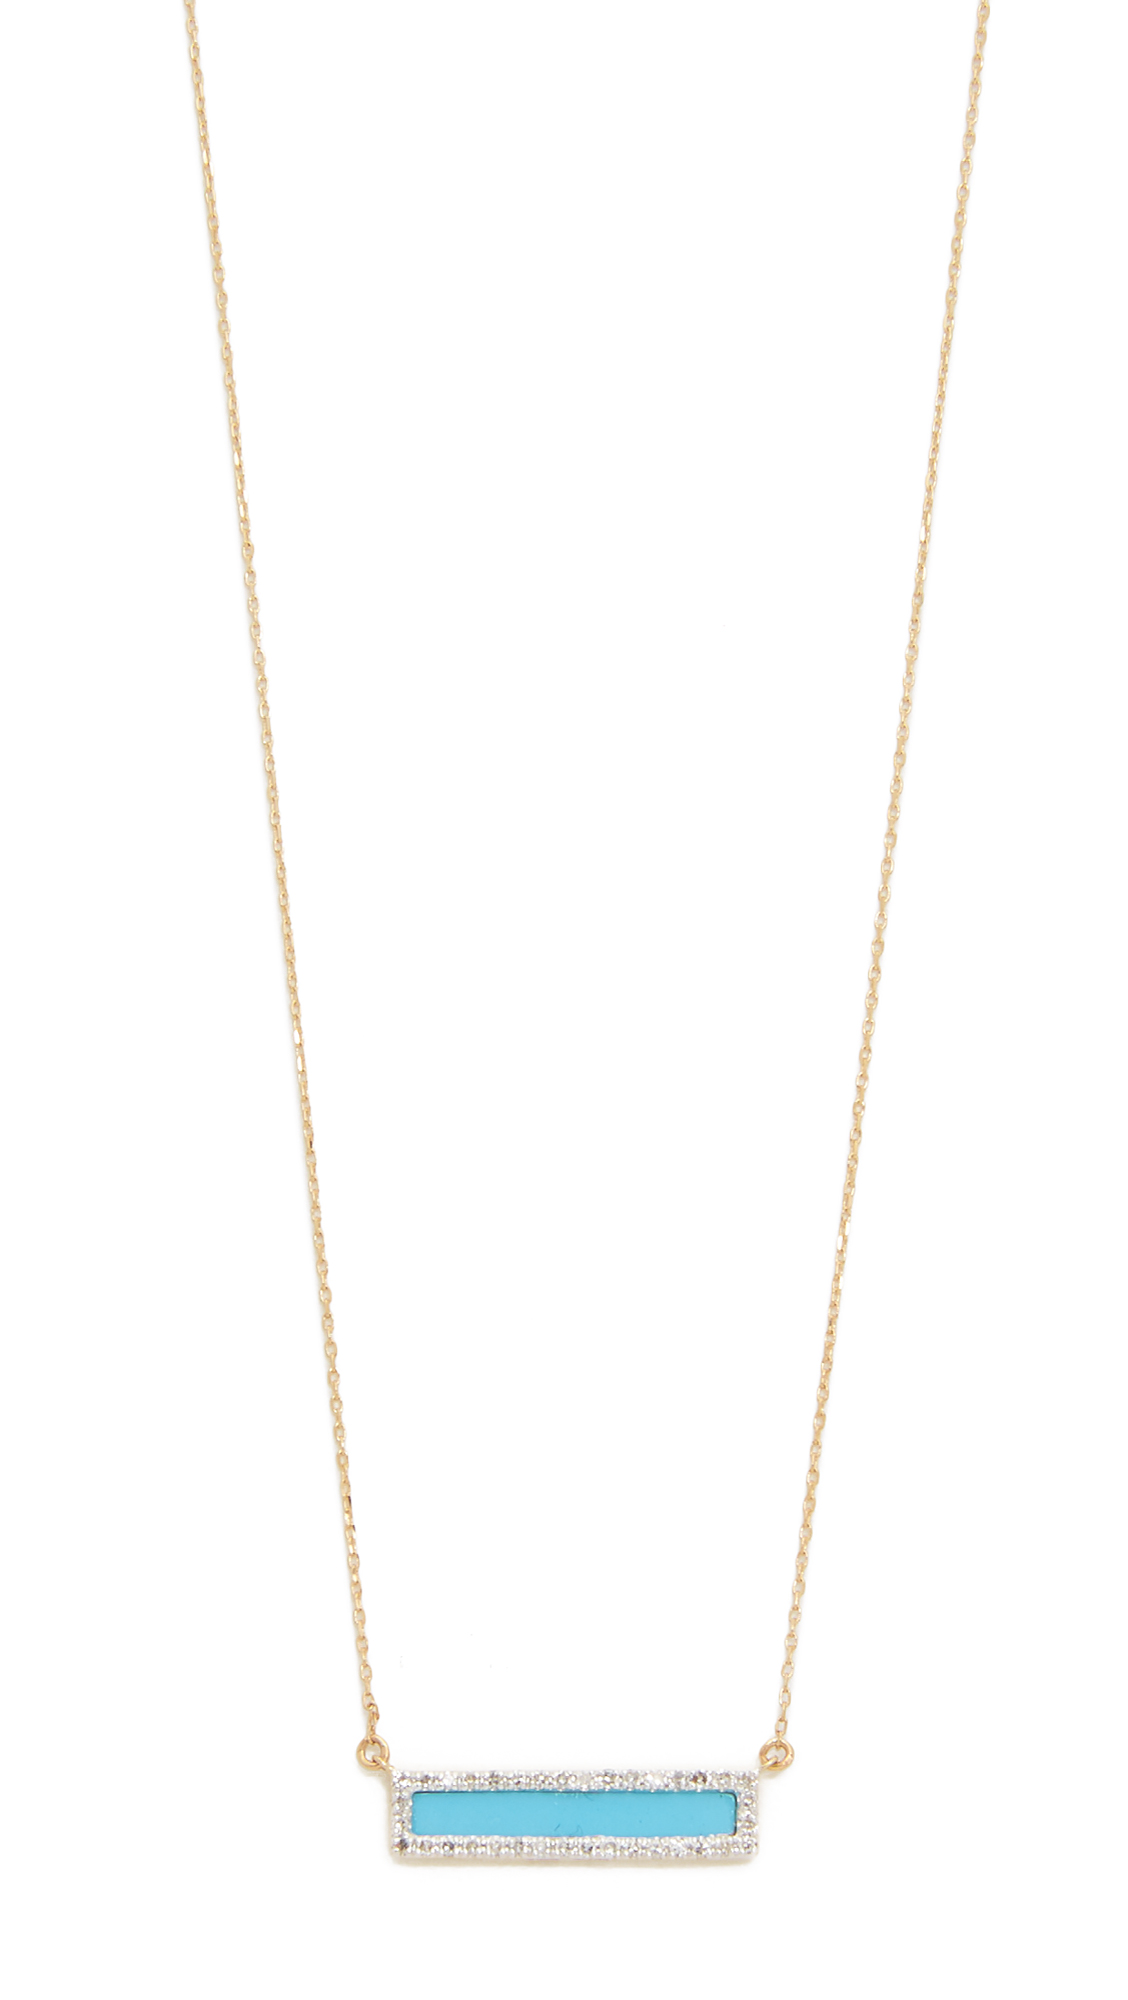 Adina Reyter Turquiose + Diamond Bar Necklace - Turquoise/Gold